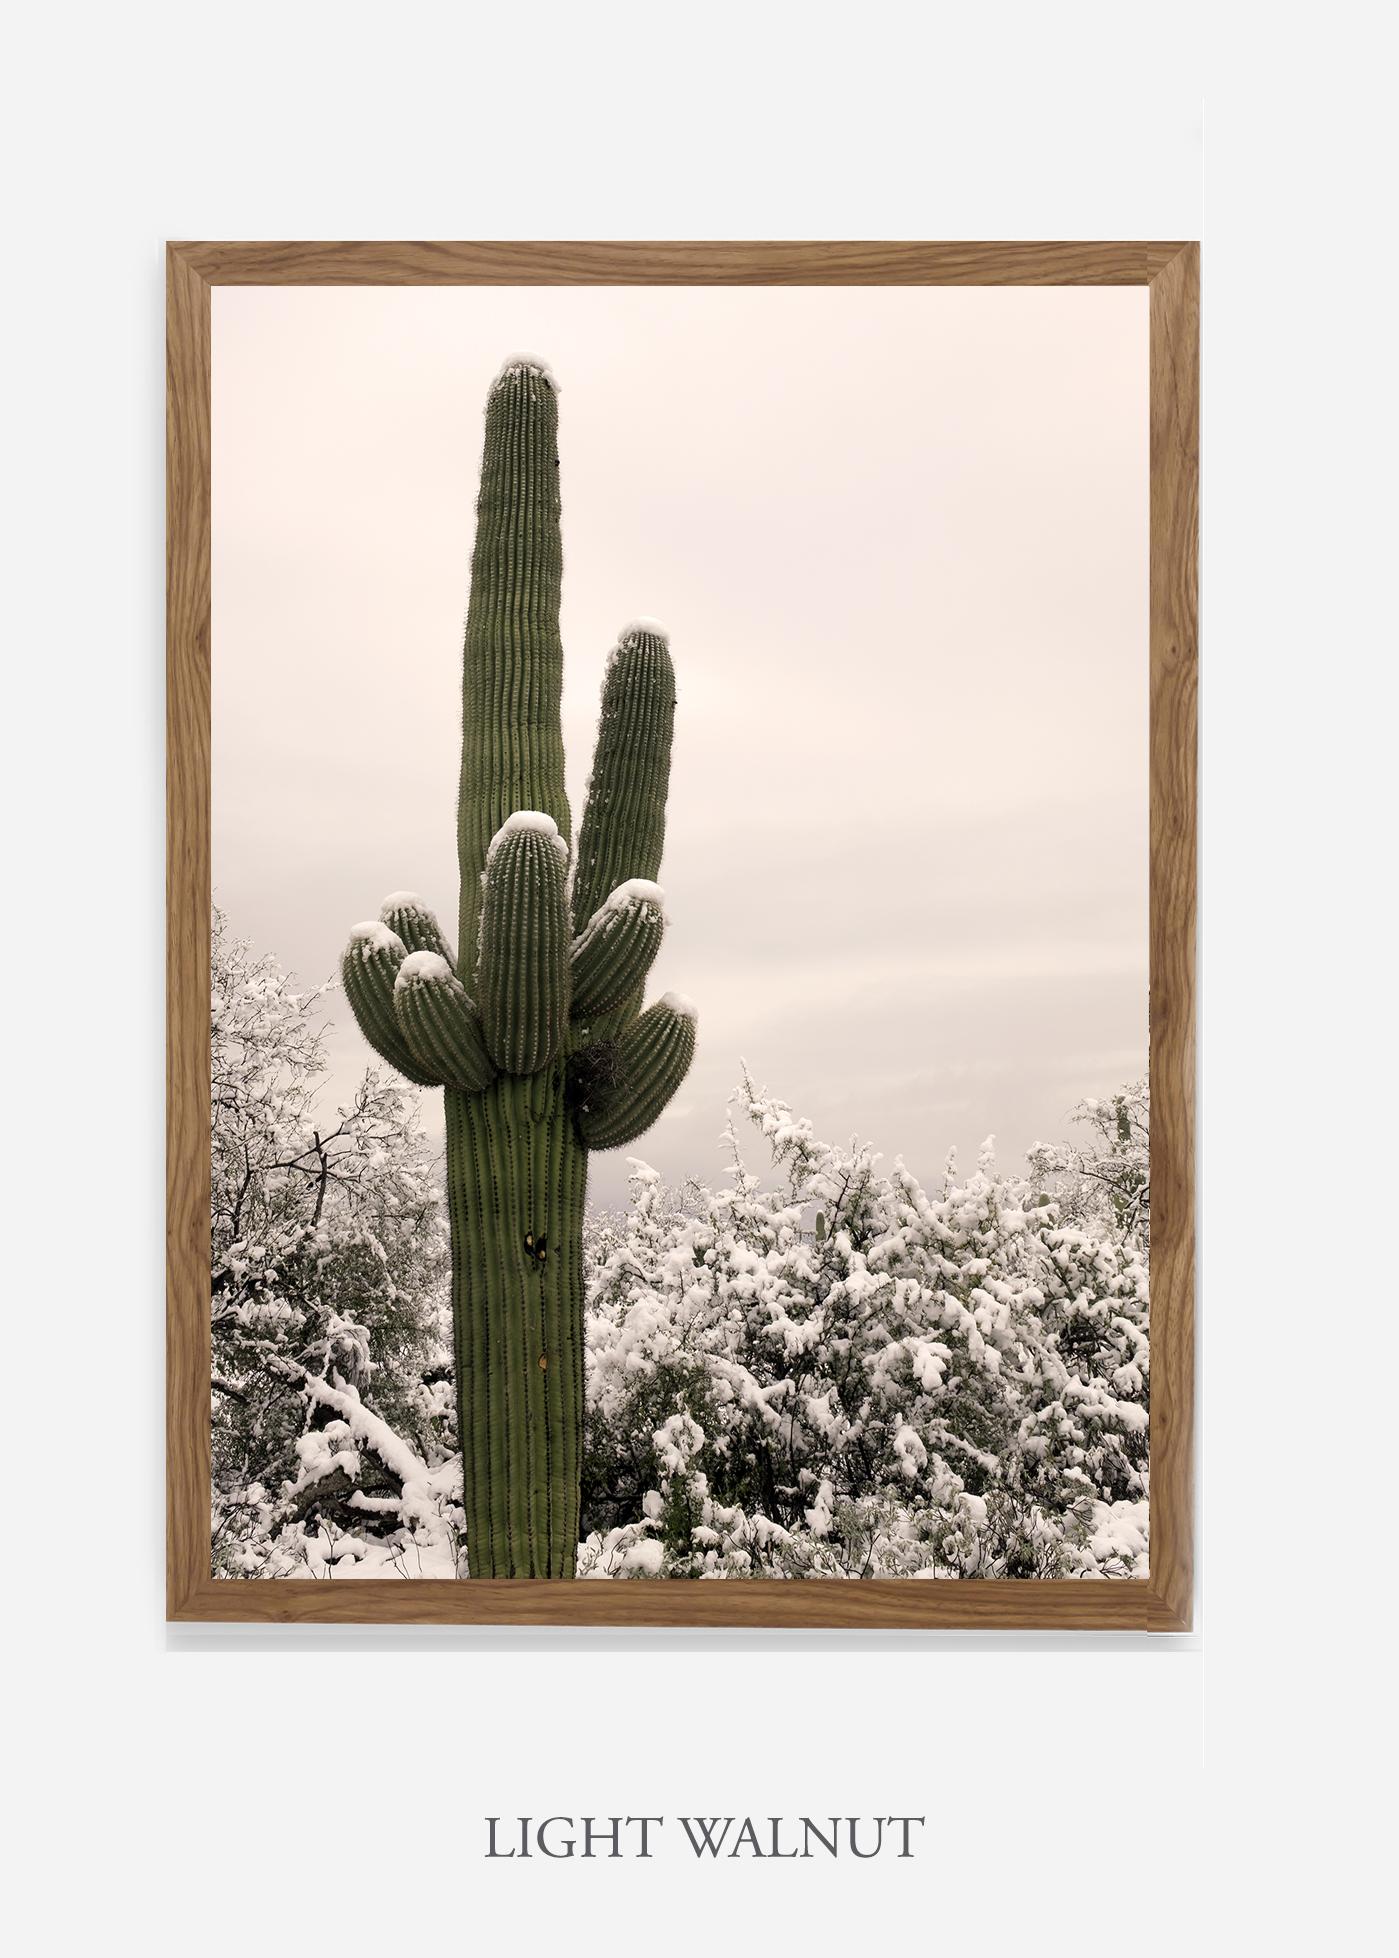 nomat-lightwalnutframe-saguaroNo.6-wildercalifornia-art-wallart-cactusprint-homedecor-prints-arizona-botanical-artwork-interiordesign.jpg